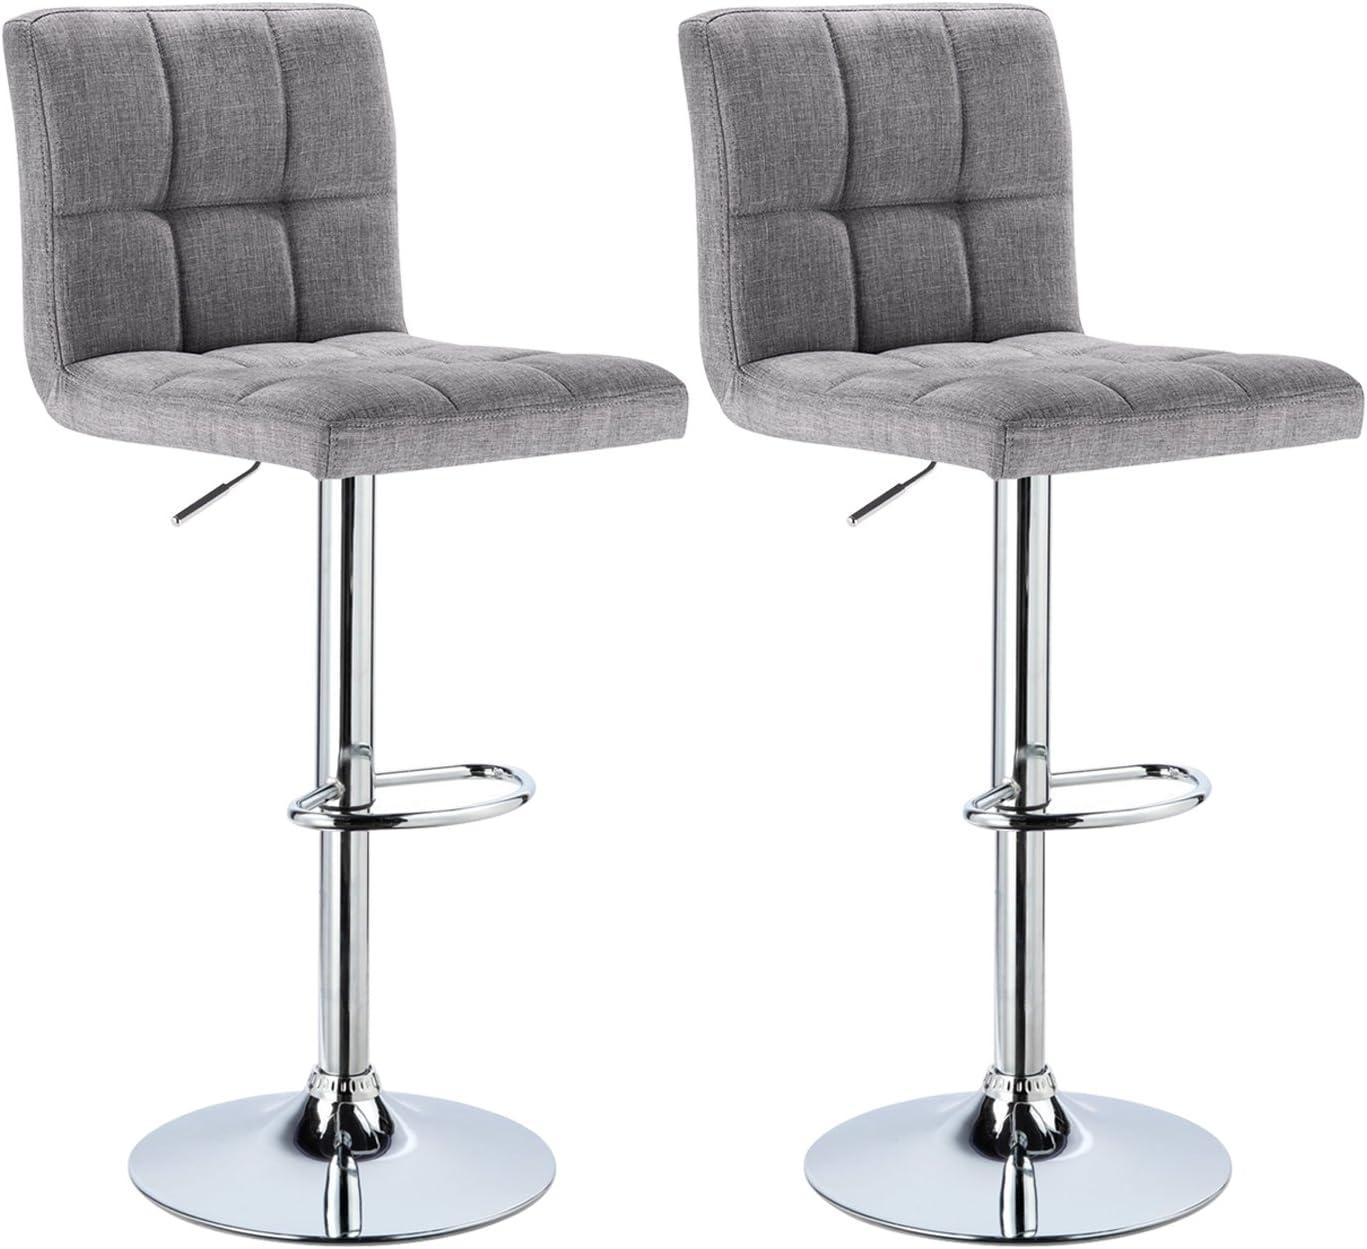 WOLTU Bar Stools Light Grey Bar Chairs Breakfast Dining Stools for Kitchen  Island Counter Bar Stools Set of 9 pcs Linen Exterior/Adjustable Swivel Gas  ...